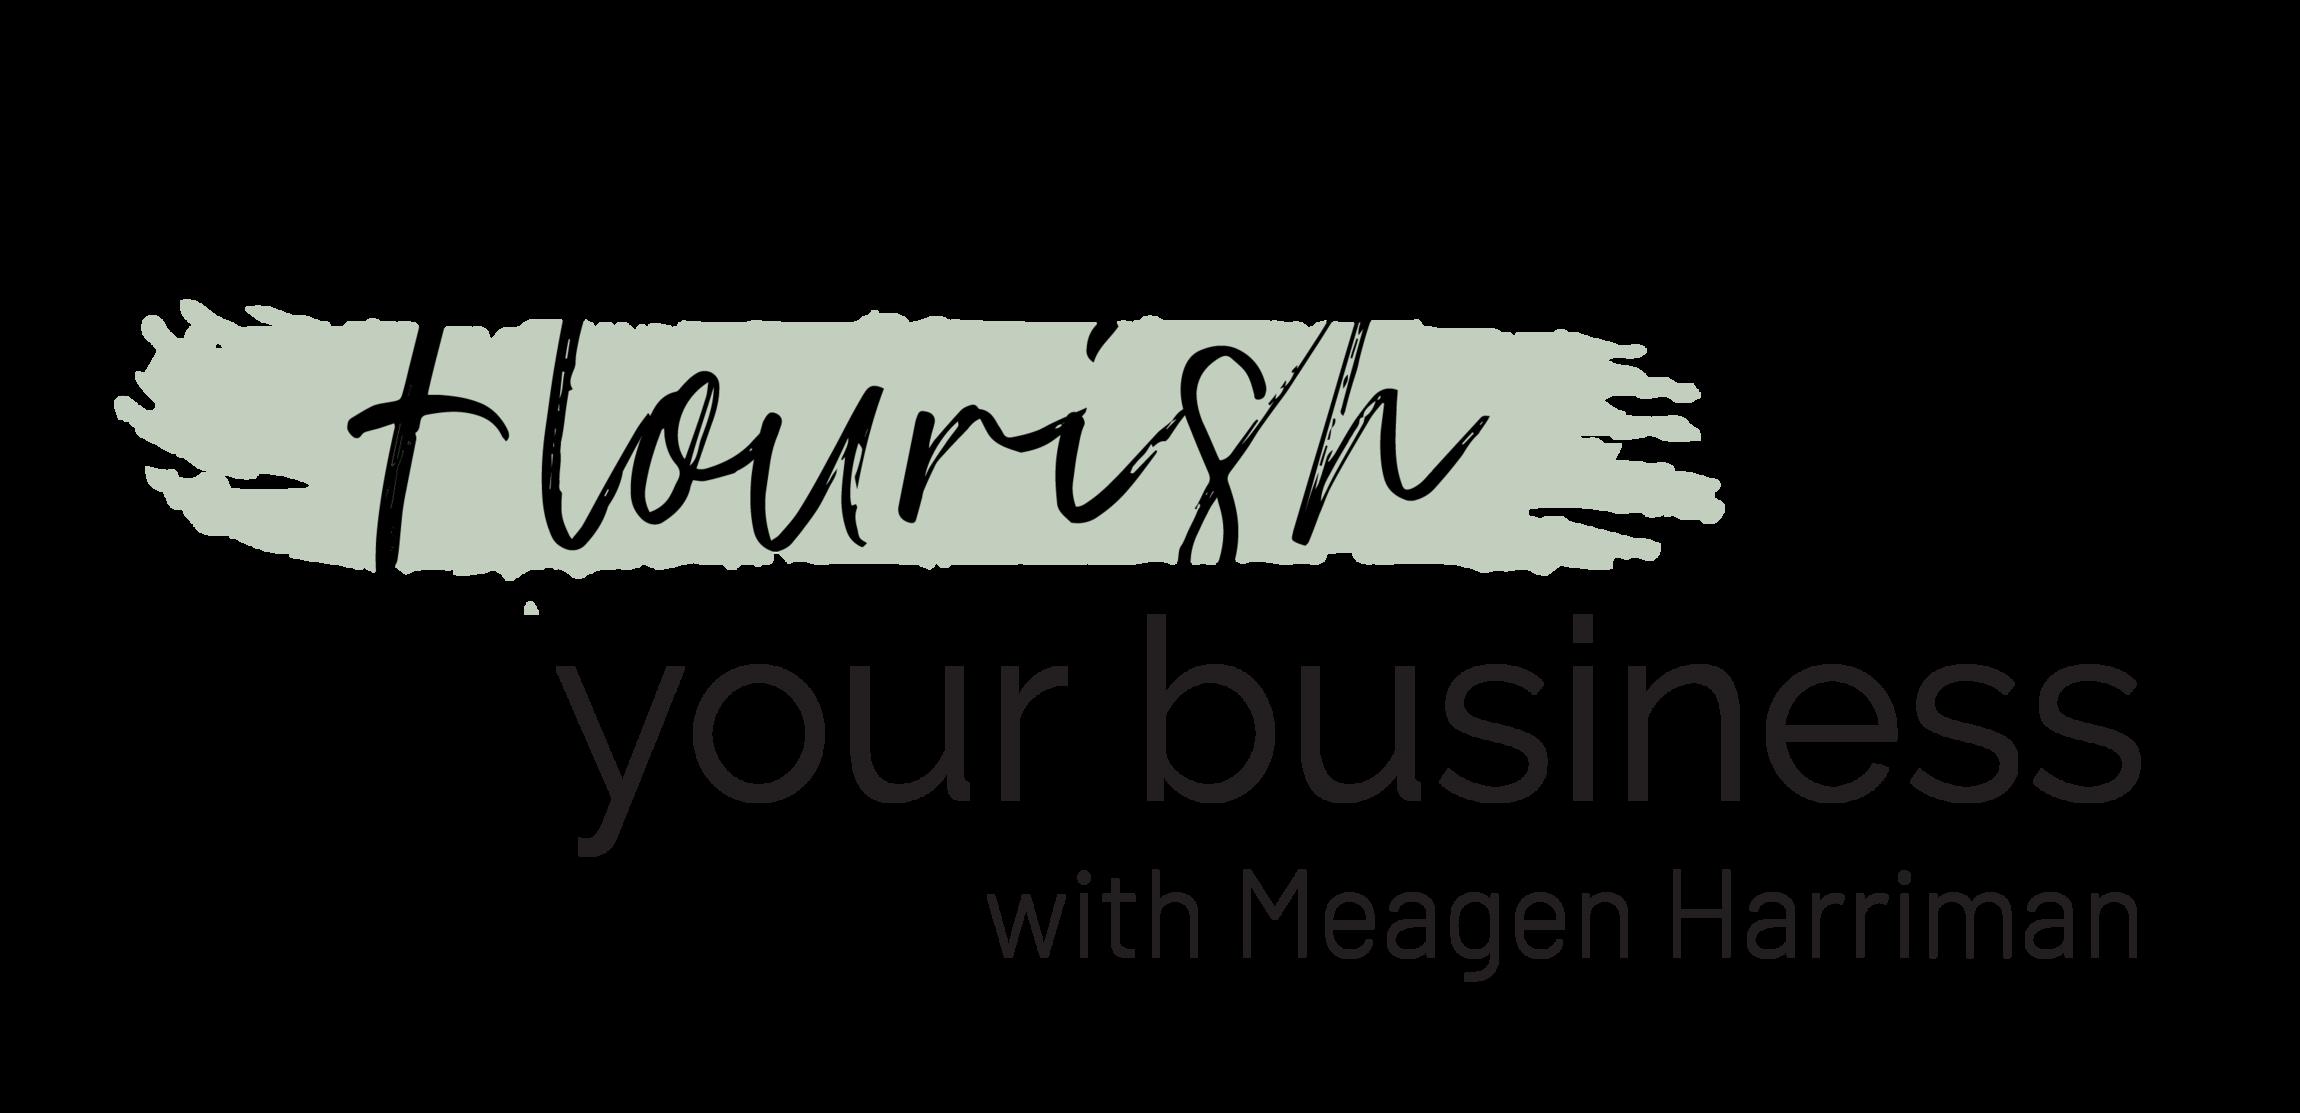 Flourish Your Business